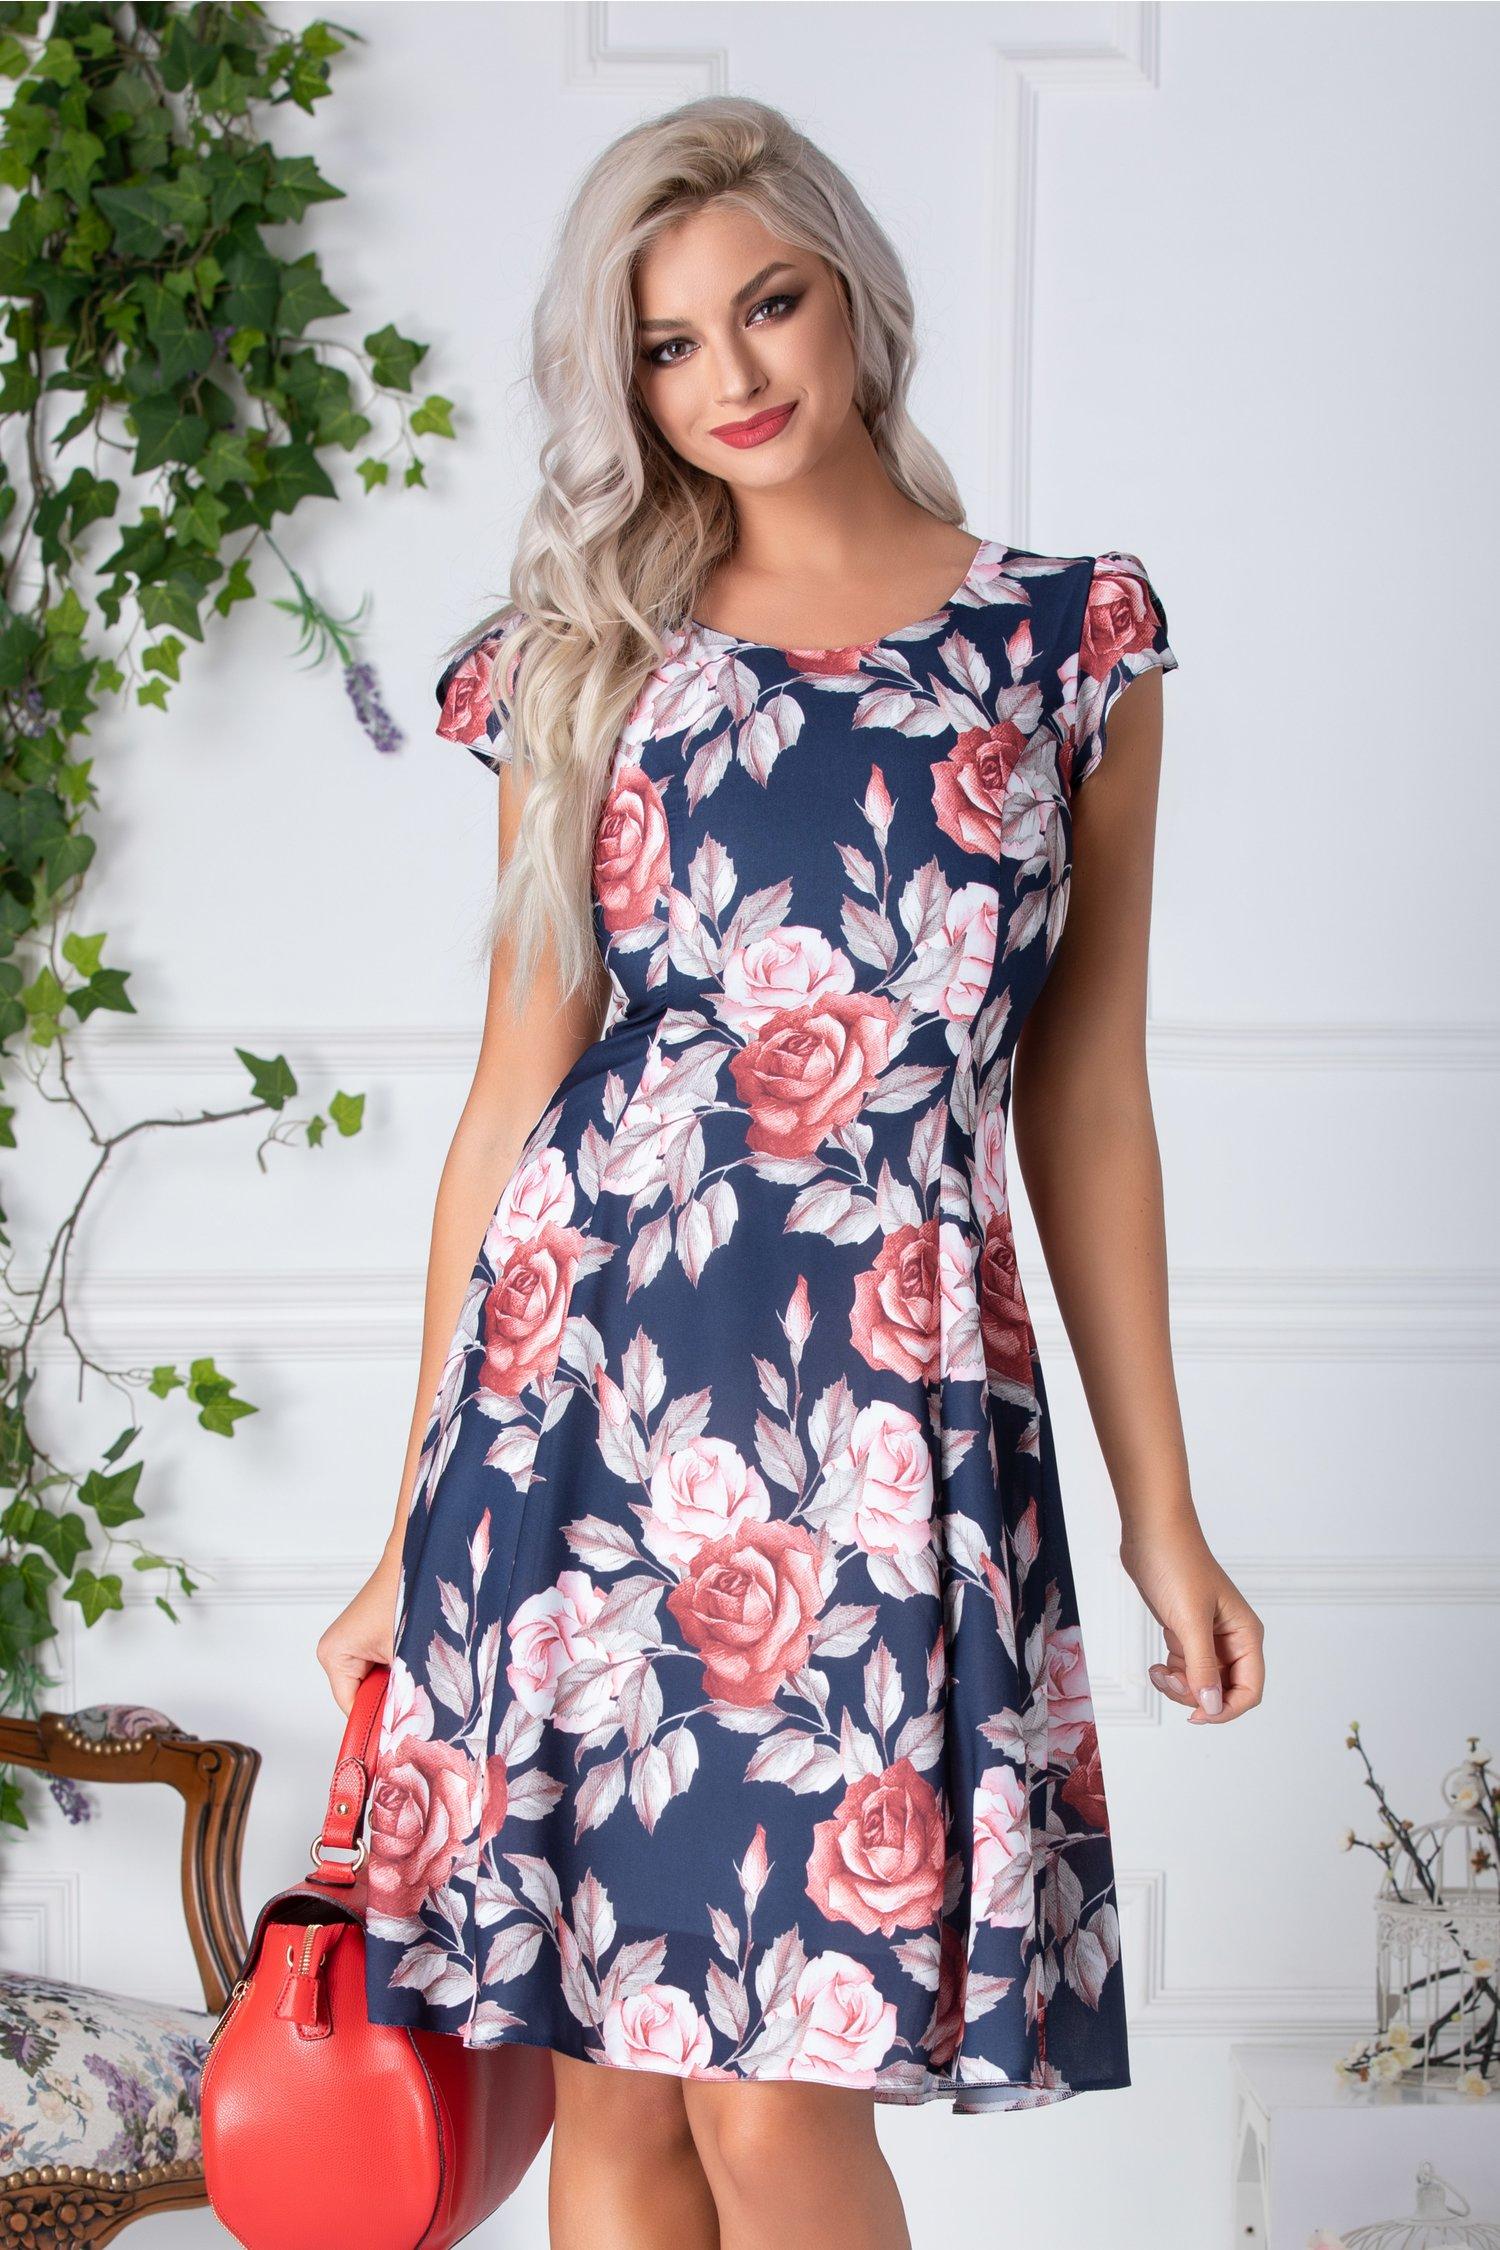 Rochie Lore bleumarin cu trandafiri roz si caramizii